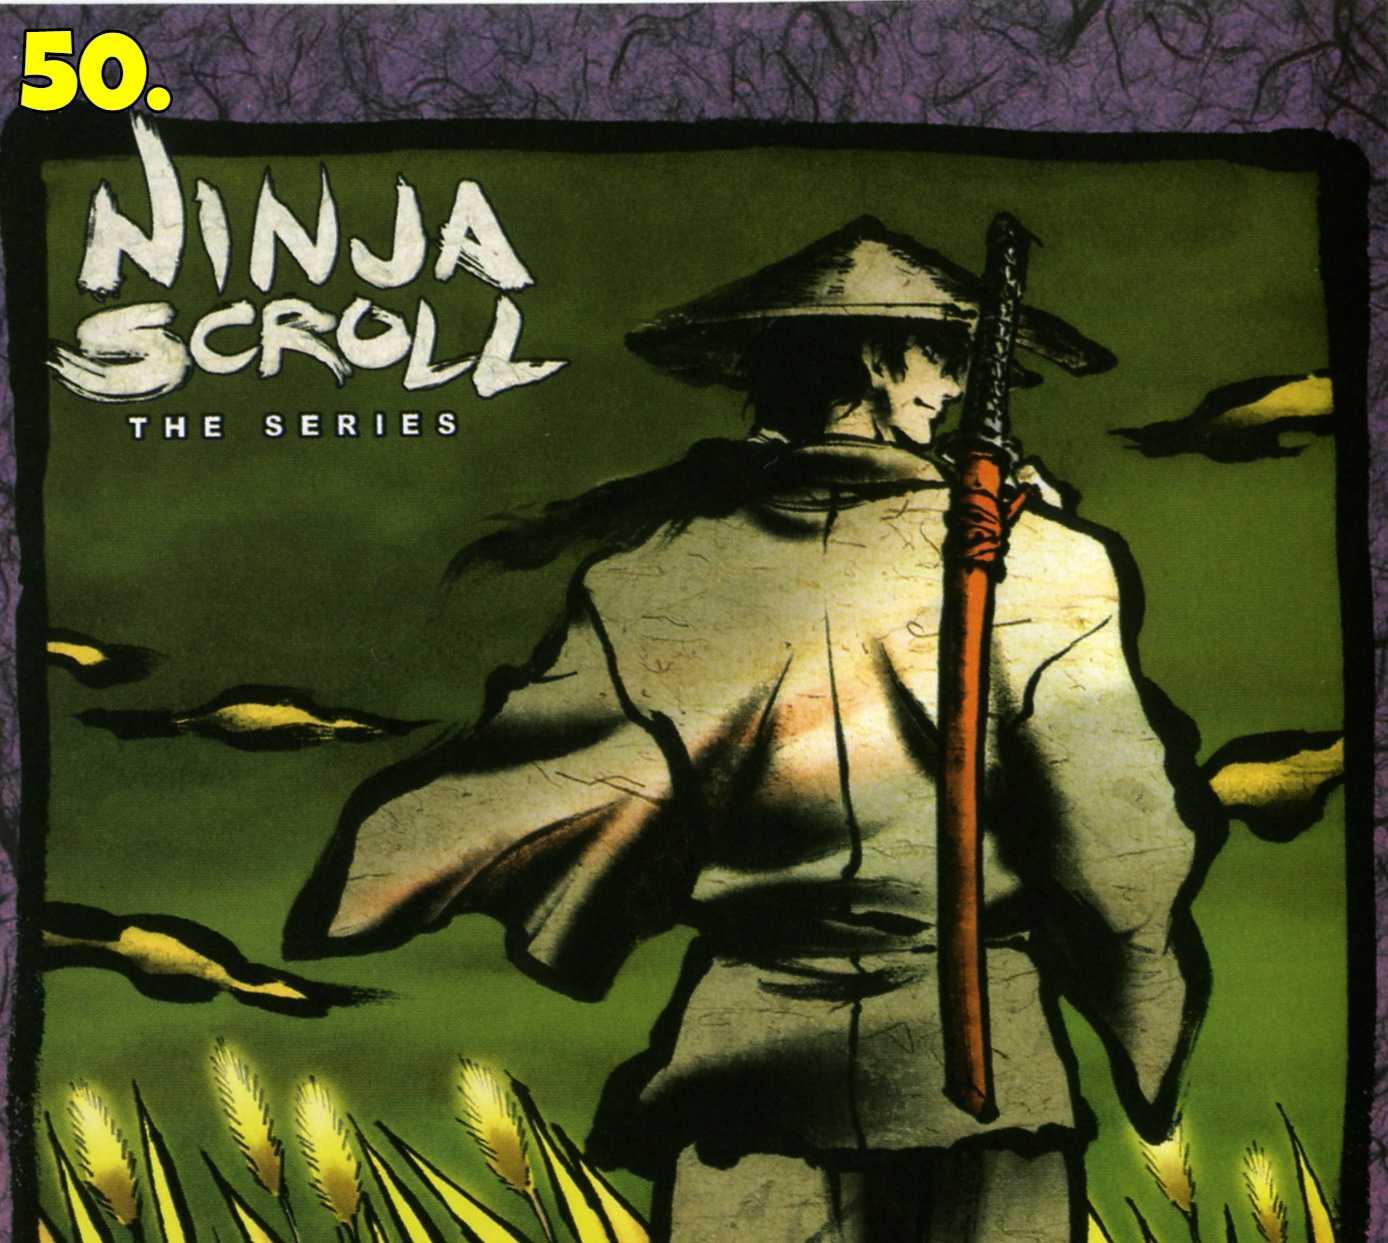 Ninja-Scroll-The-Series